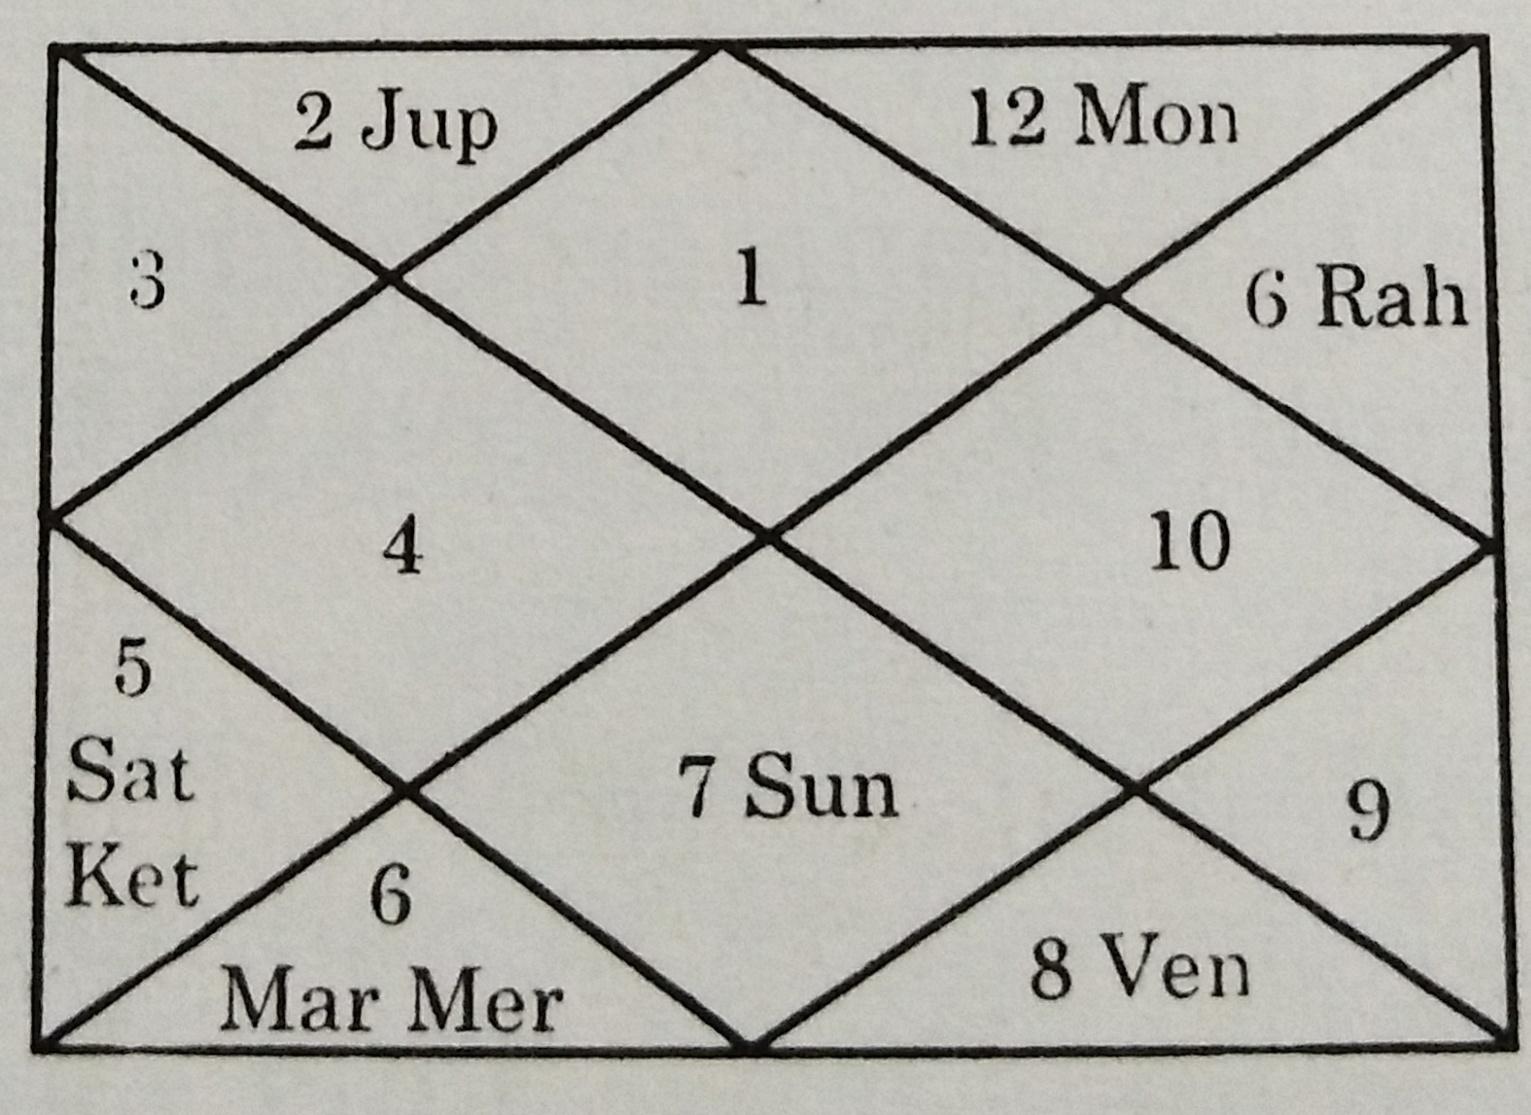 Lal kitab astrology lal kitab astrology rahull house moon12 house the planetary effects shall be calculated accordingly horoscope lal kitab nvjuhfo Gallery